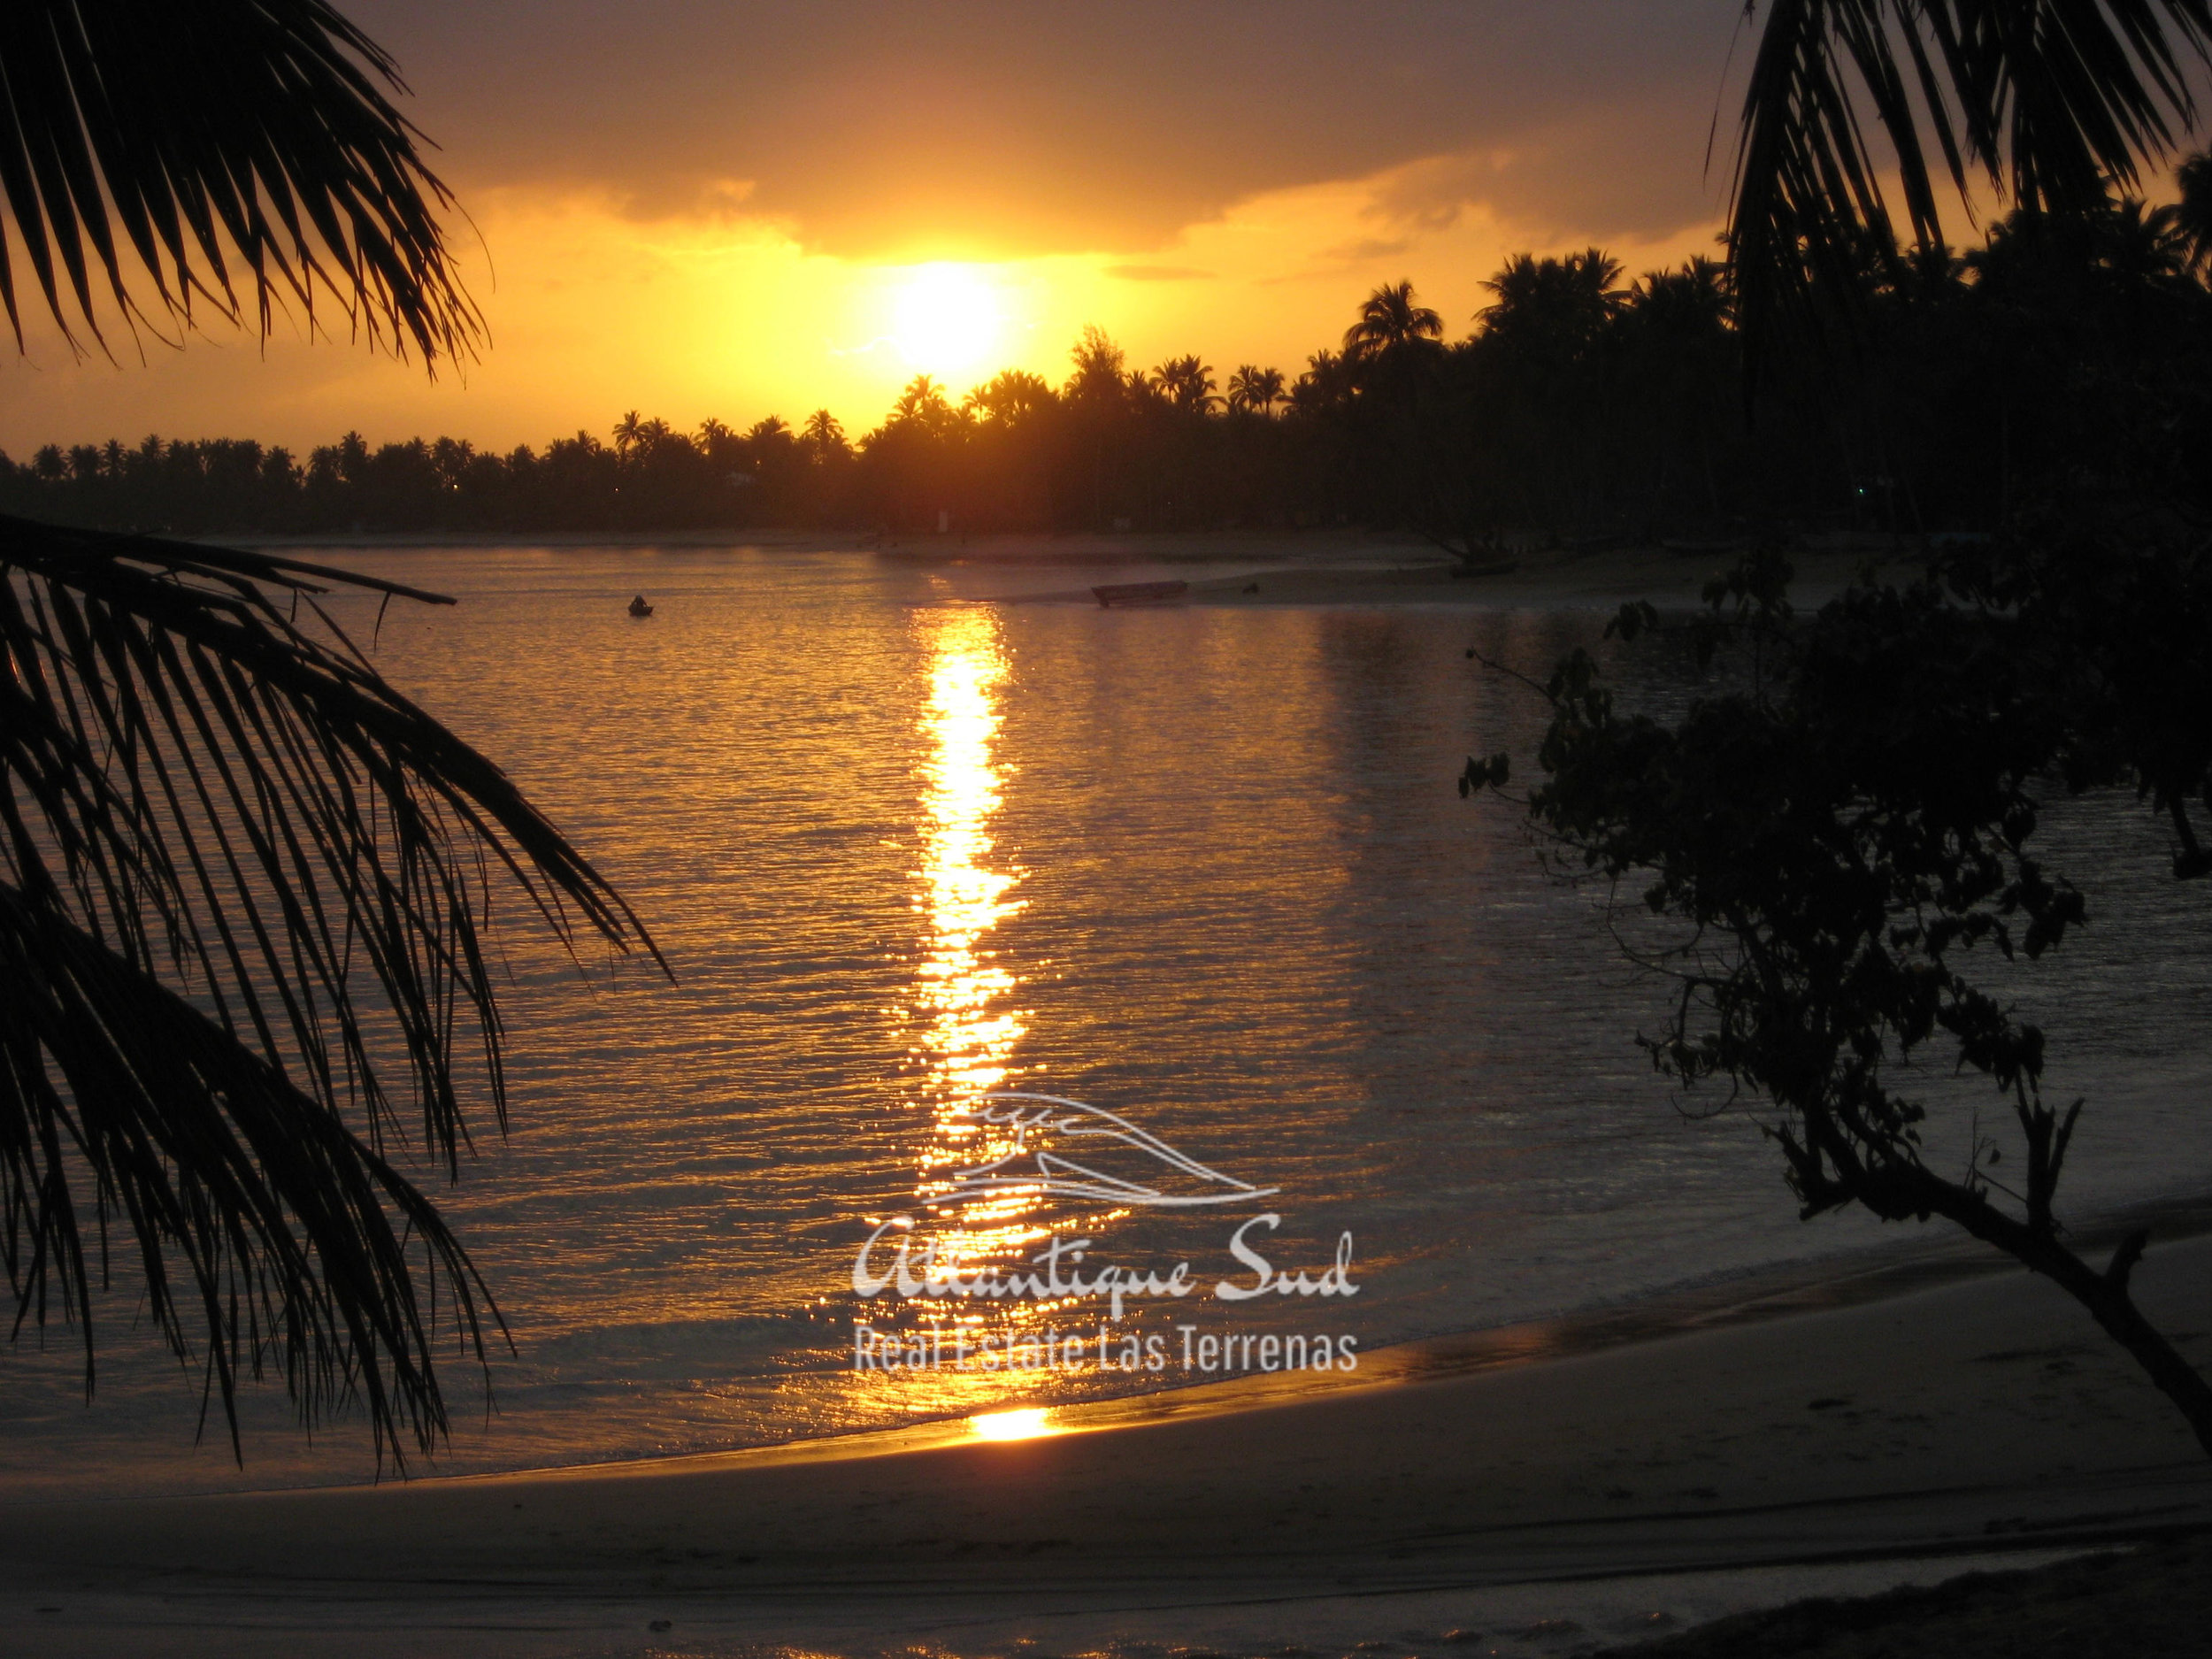 Colourful caribbean hotel in touristic heart Real Estate Las Terrenas Dominican Republic24.jpg